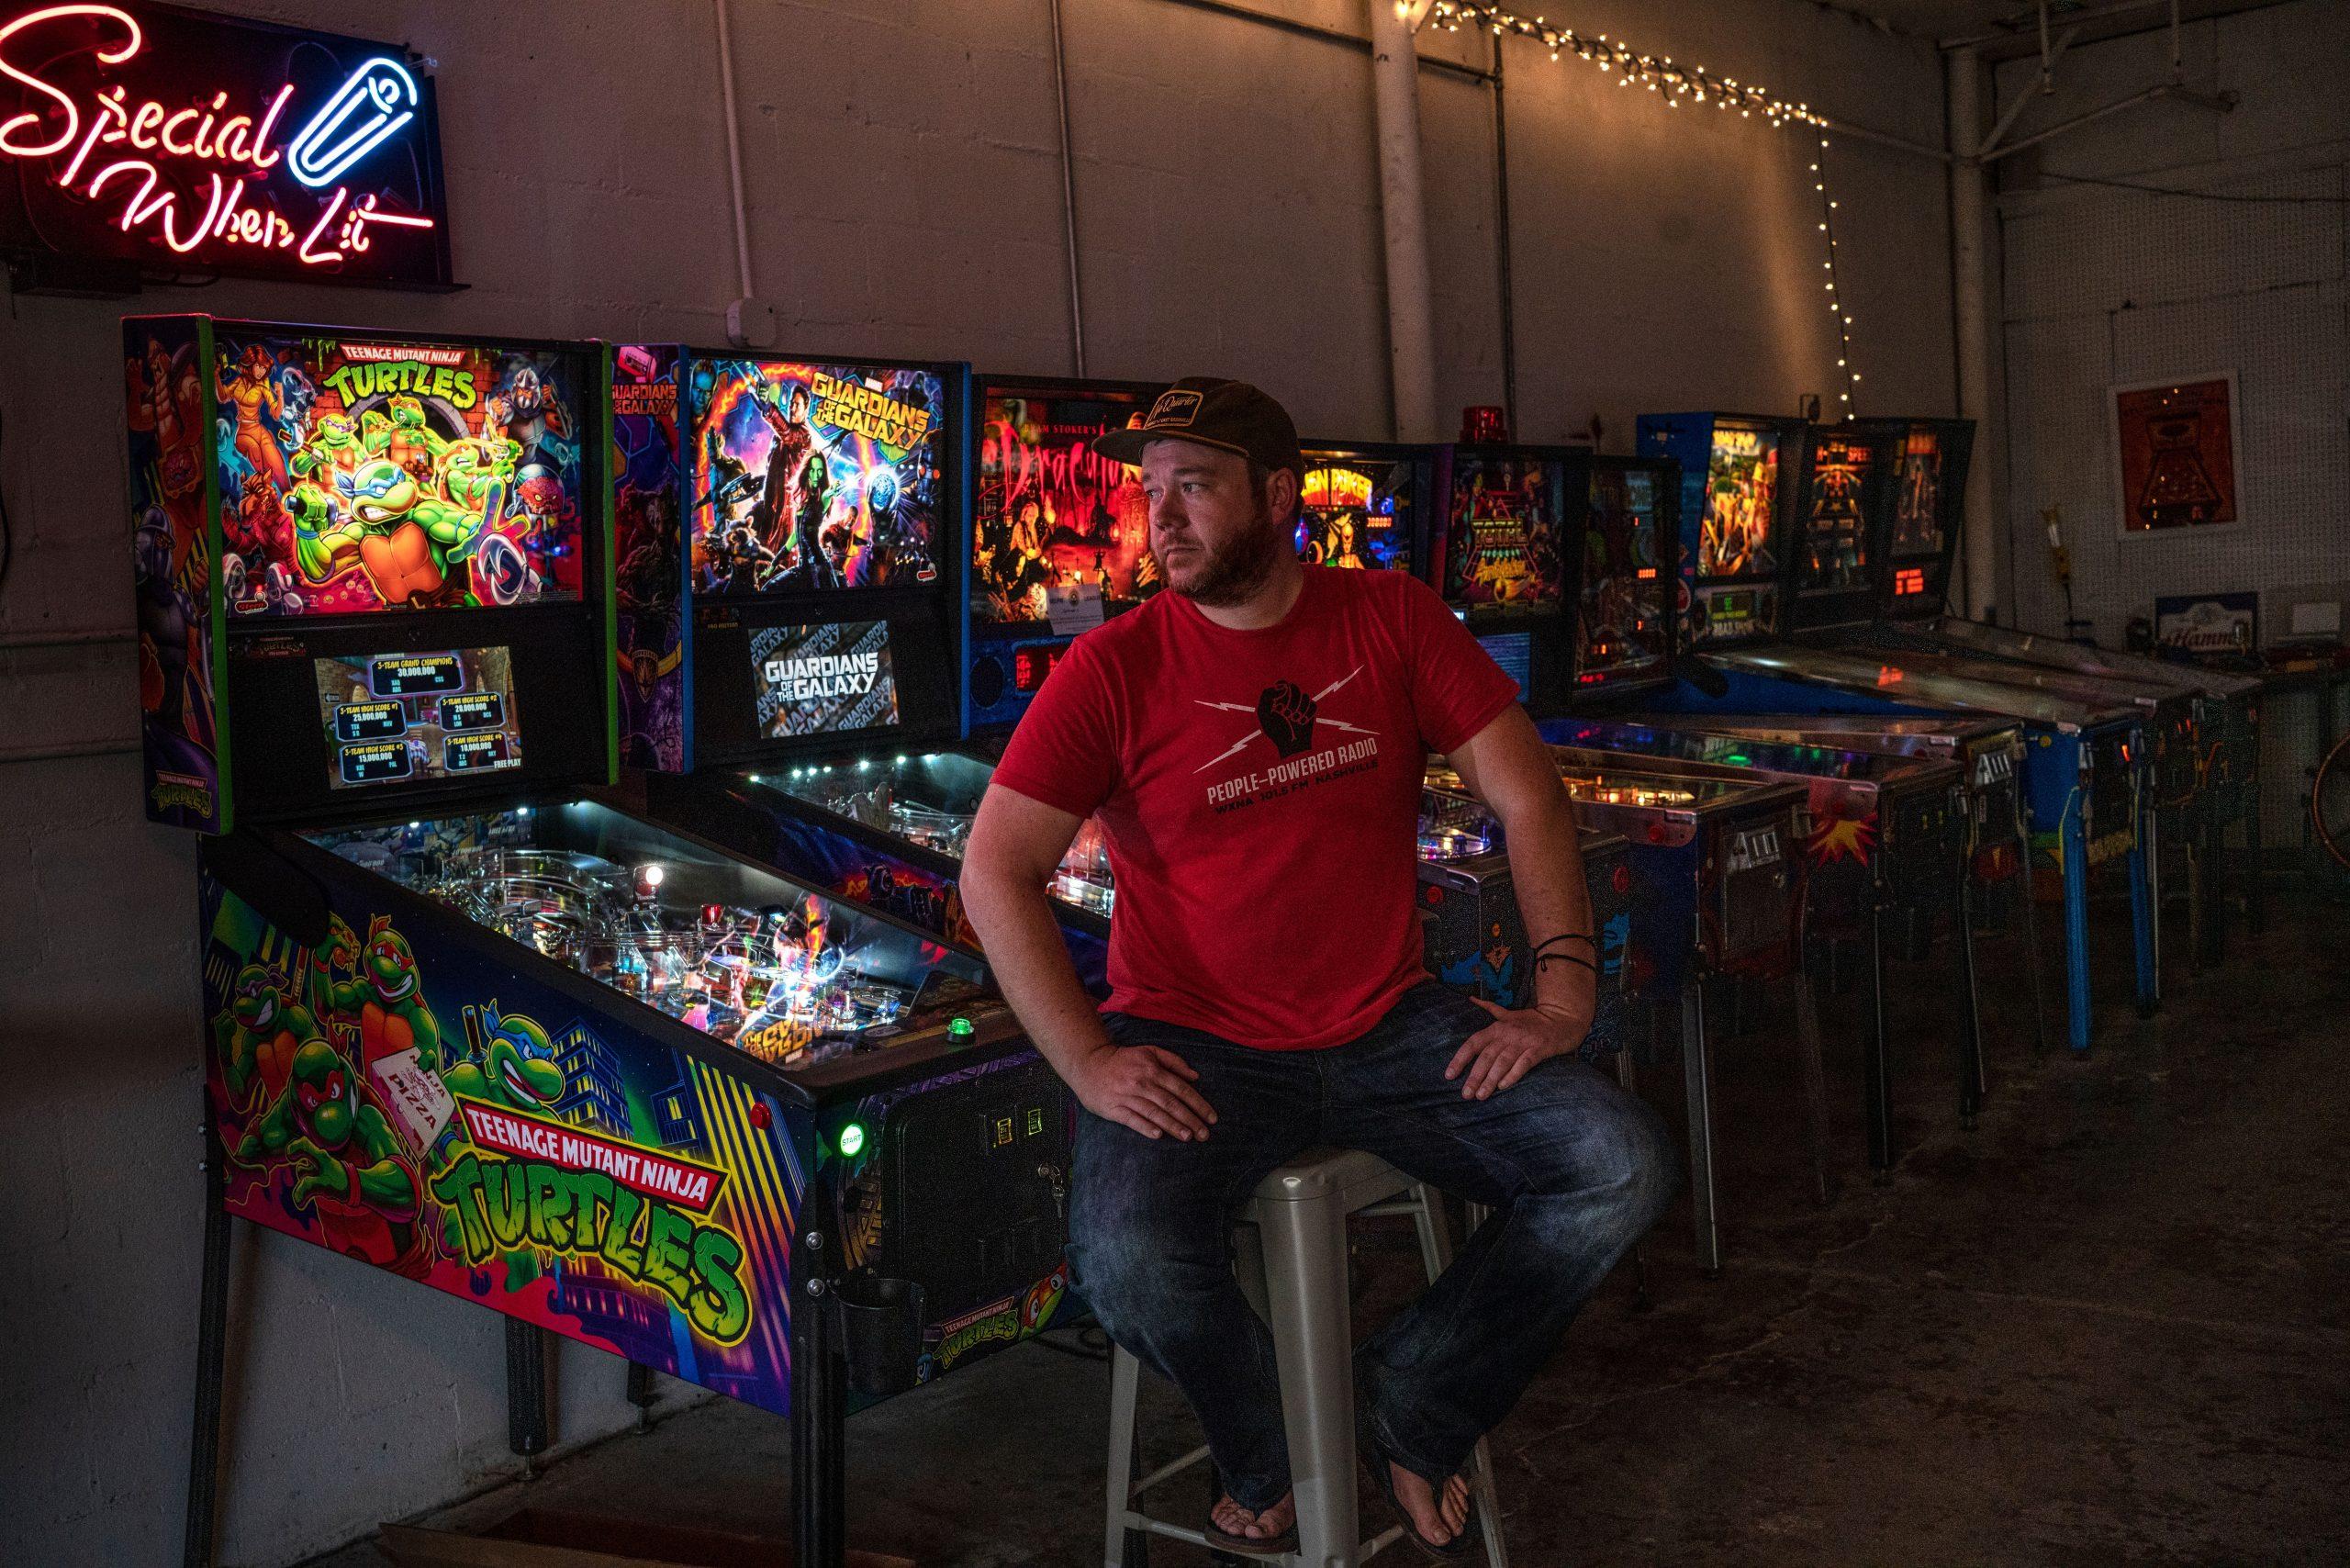 Seth Steele, bar owner and COVID-19 statistics watchdog, in his pinball machine warehouse. (Photo: John Partipilo)